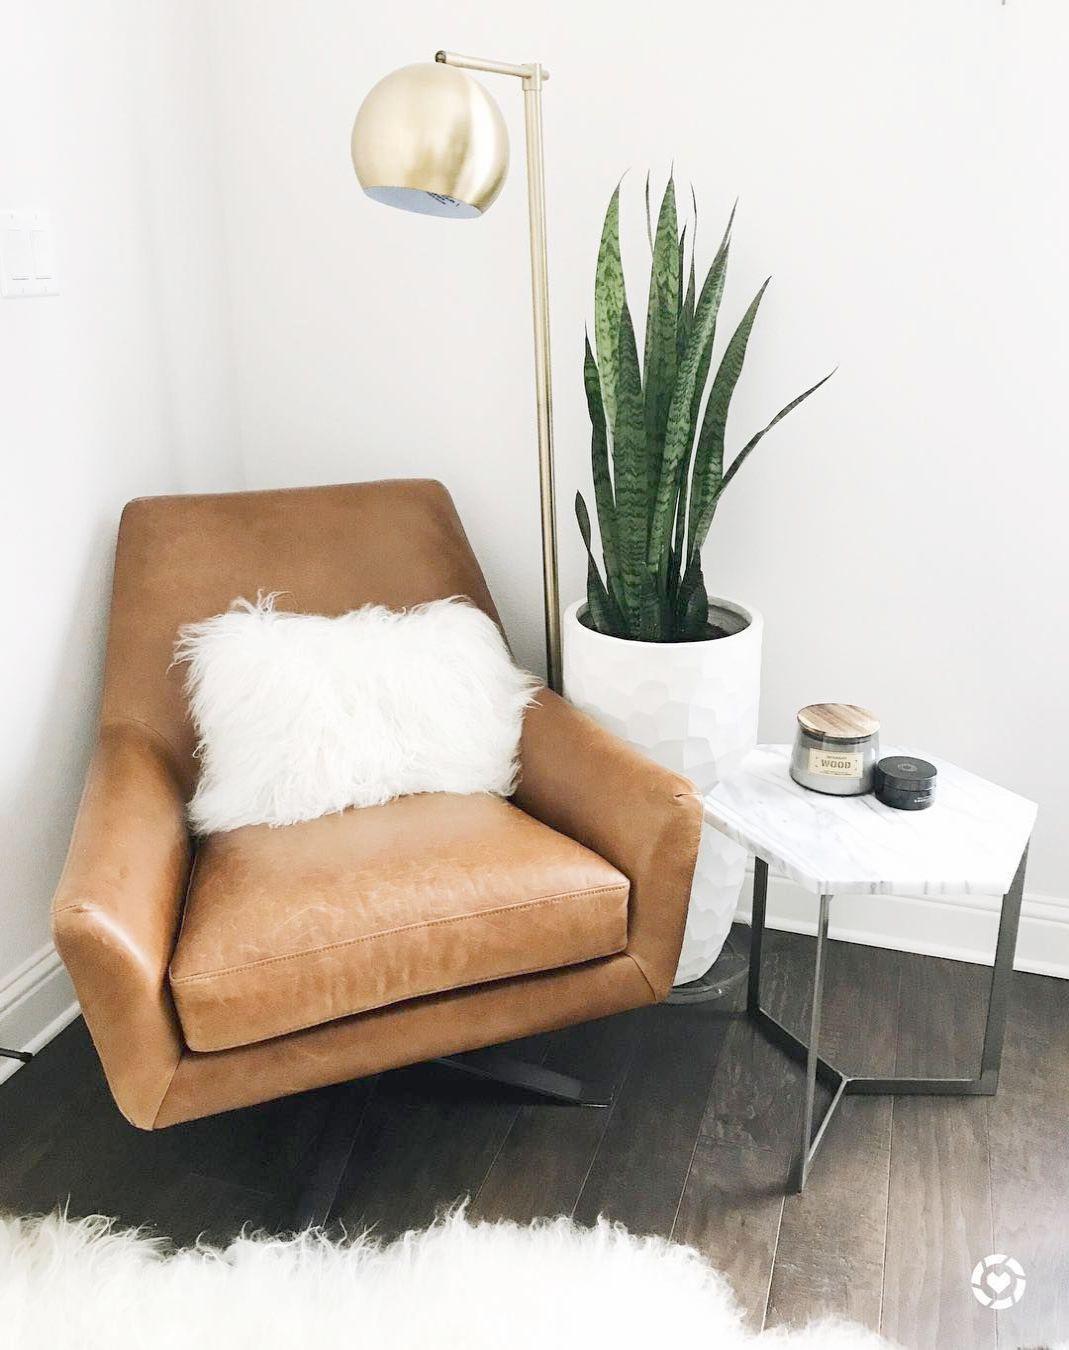 Home Decor And Renovations Magazine Manitoba Edition Many Interior